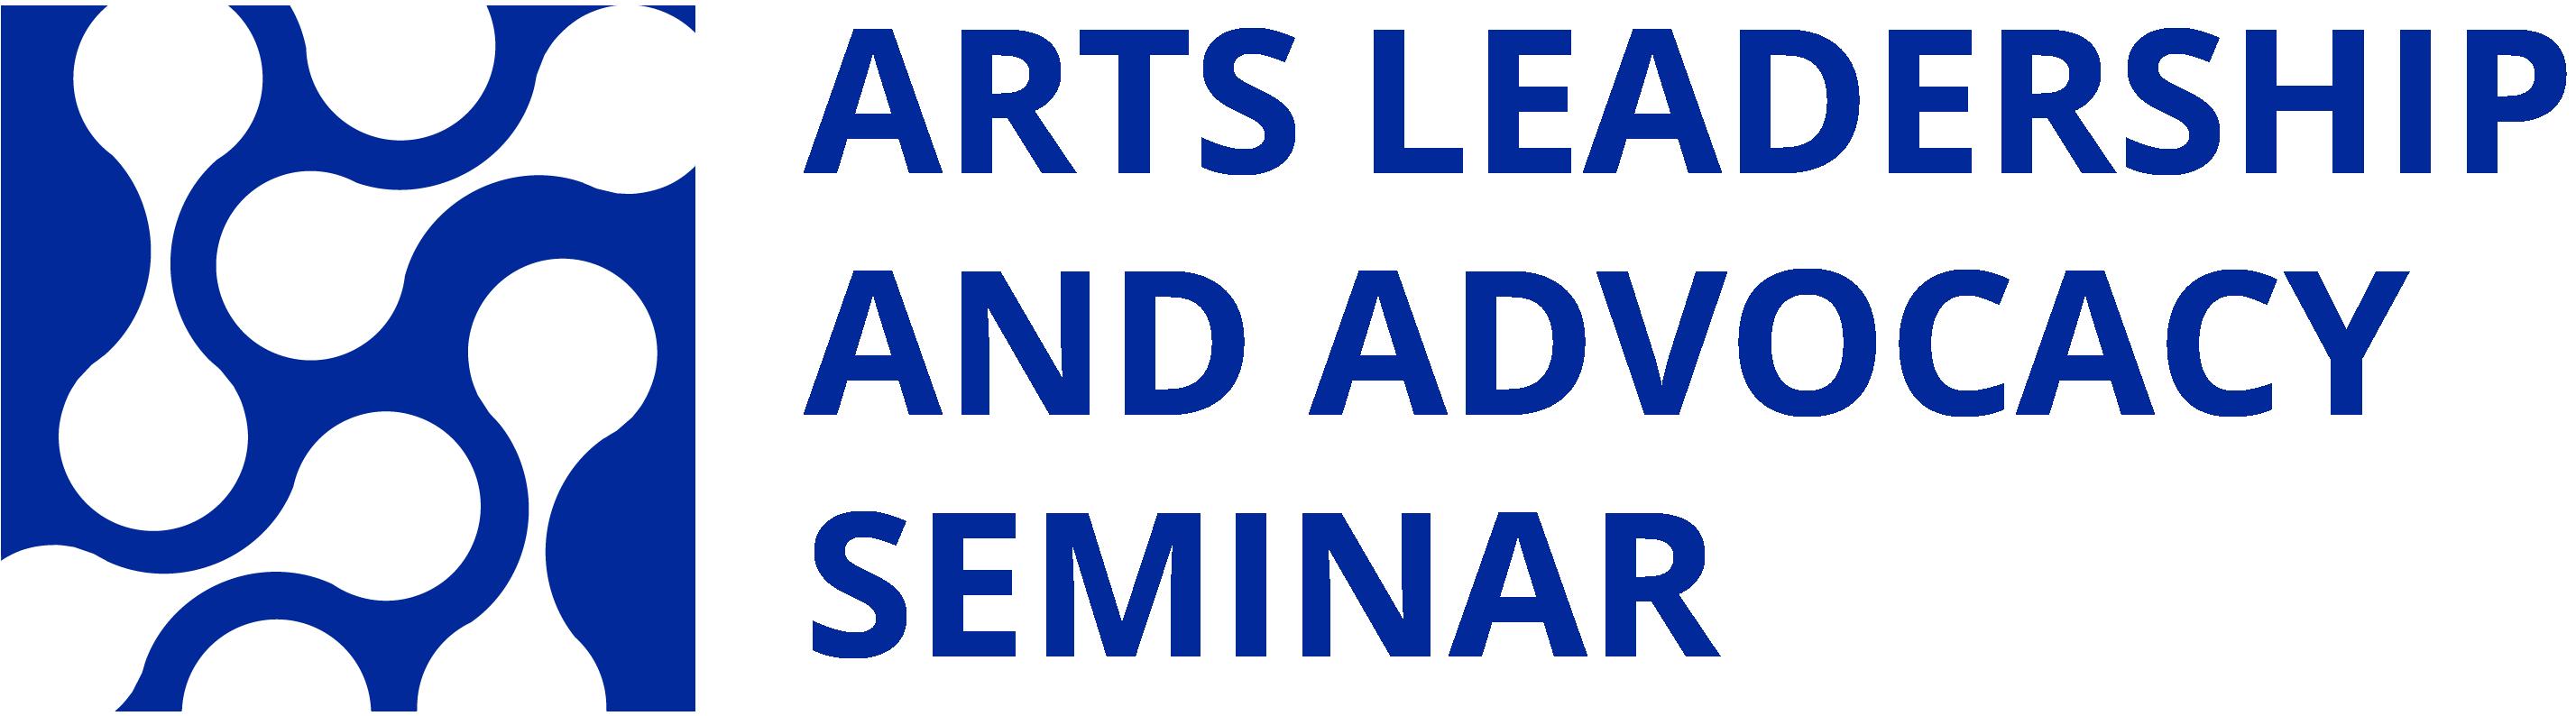 Arts Leadership and Advocacy Seminar Logo